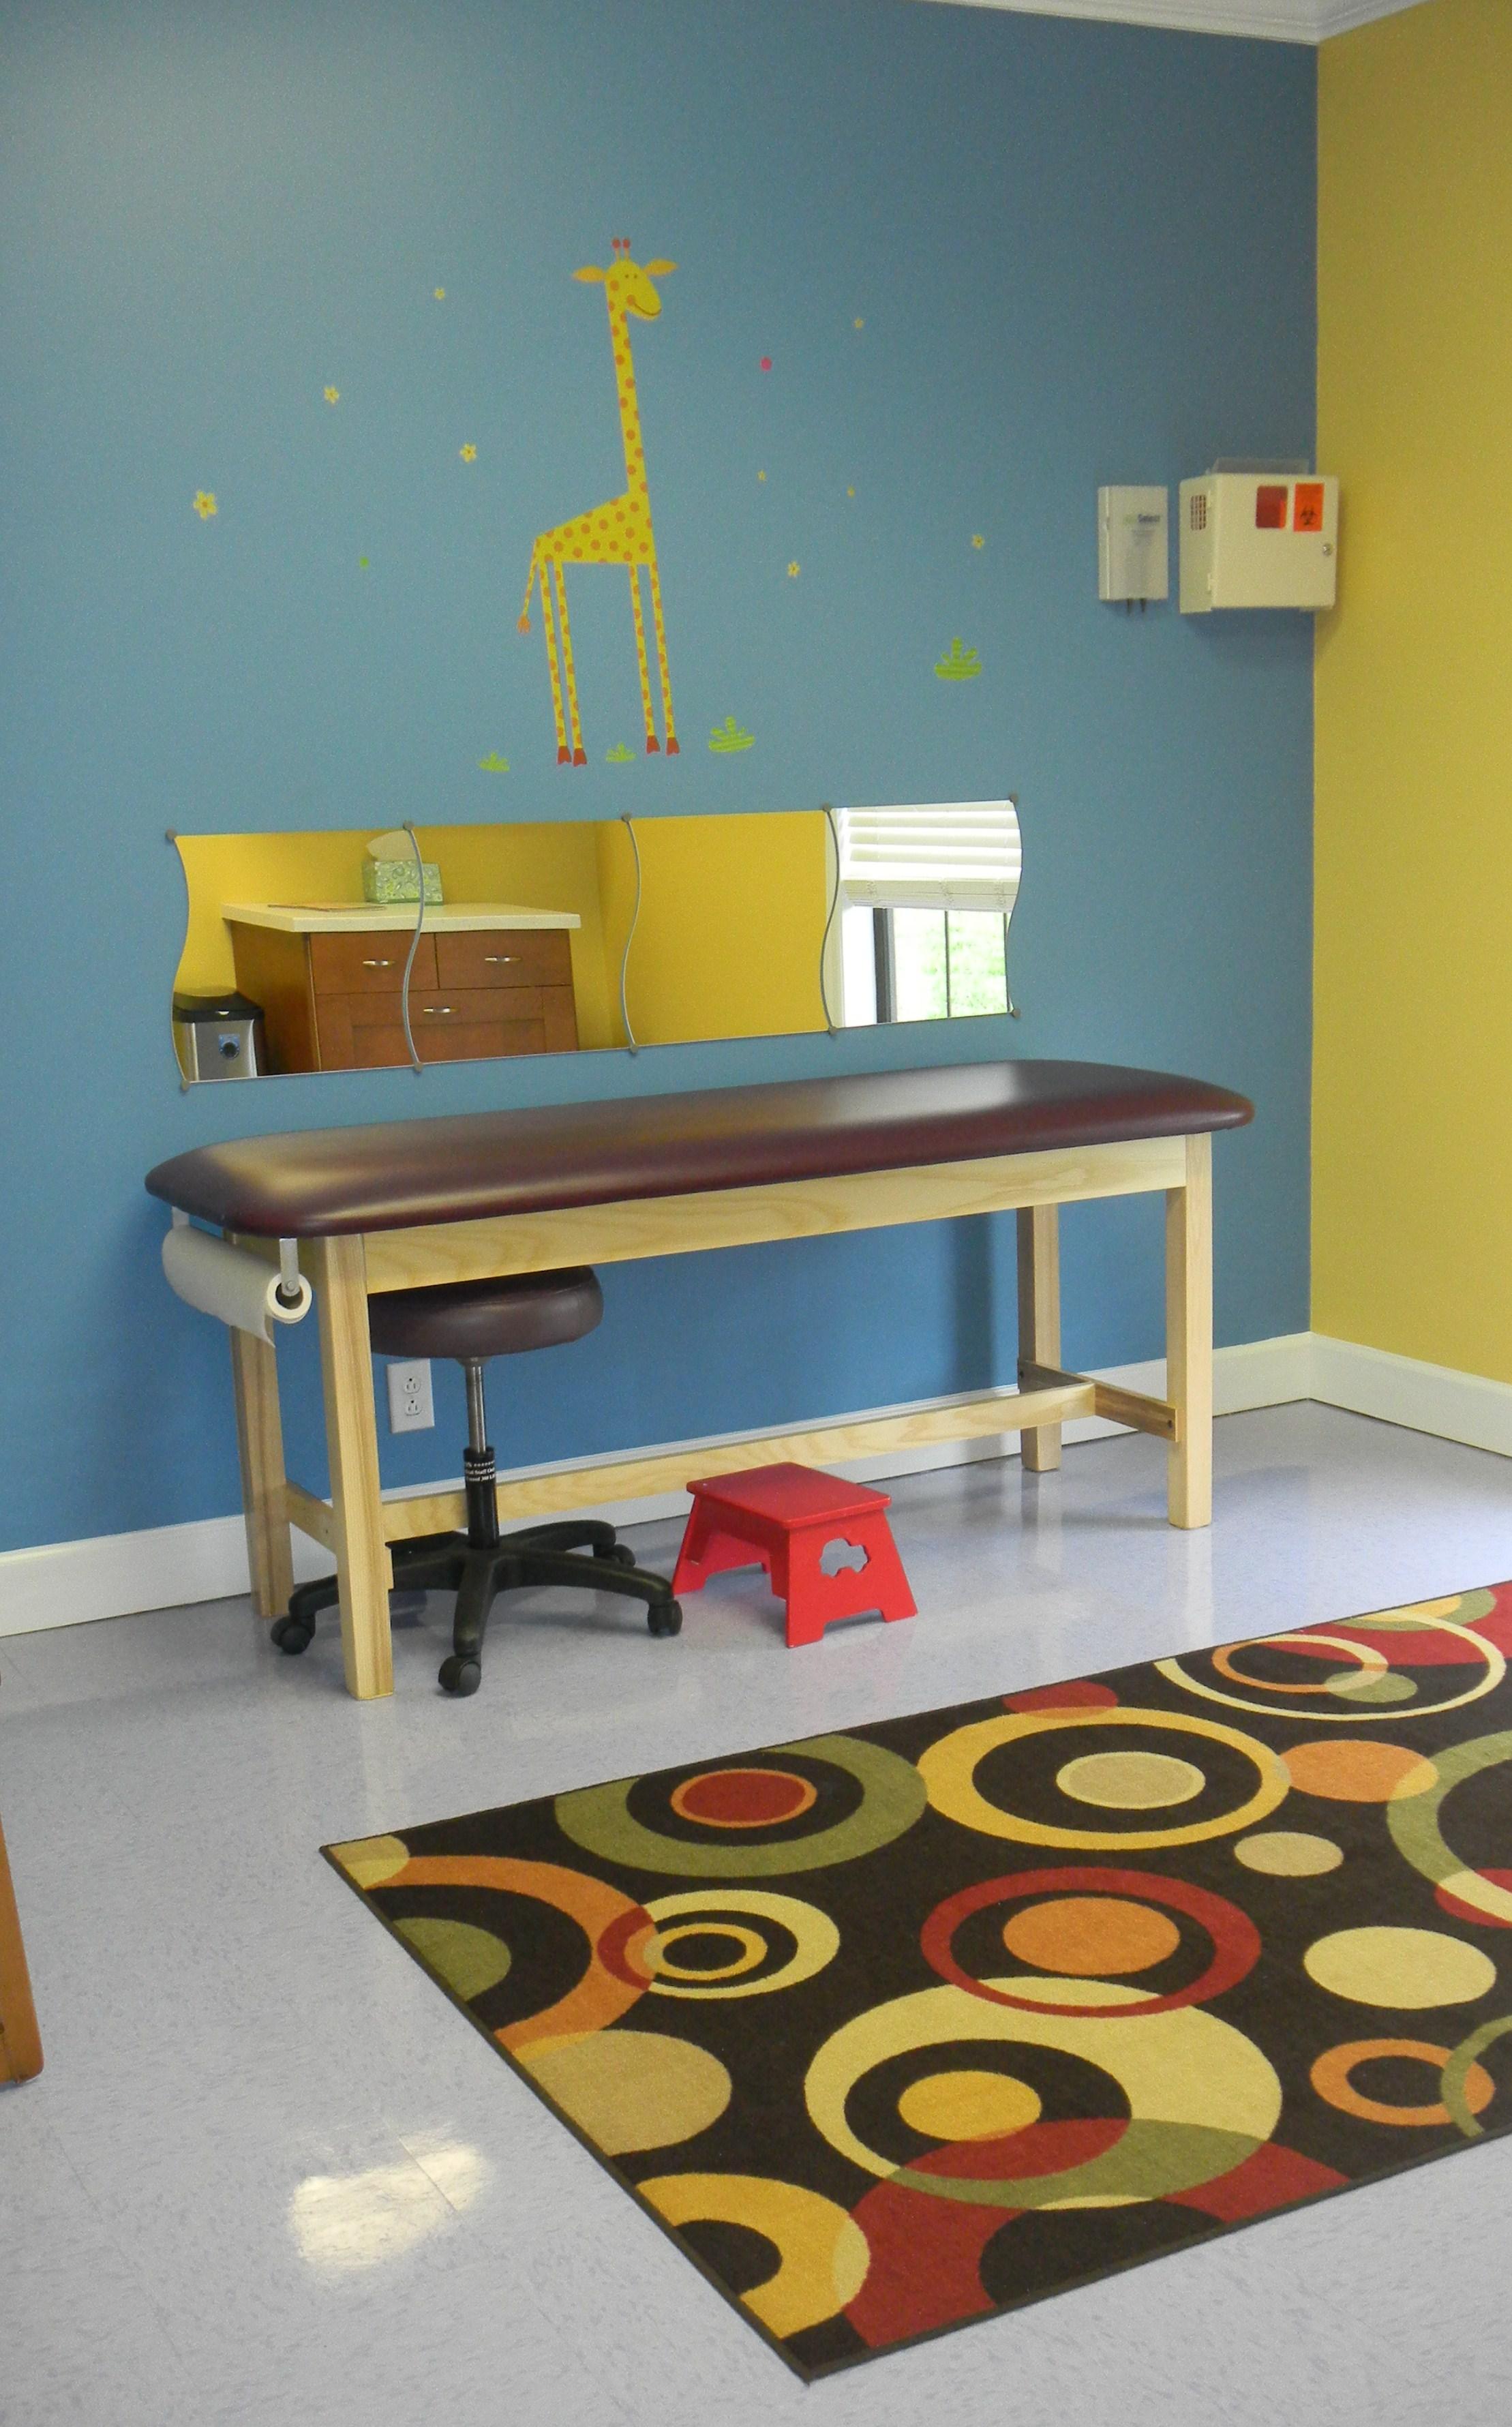 Smyrna children's waiting room